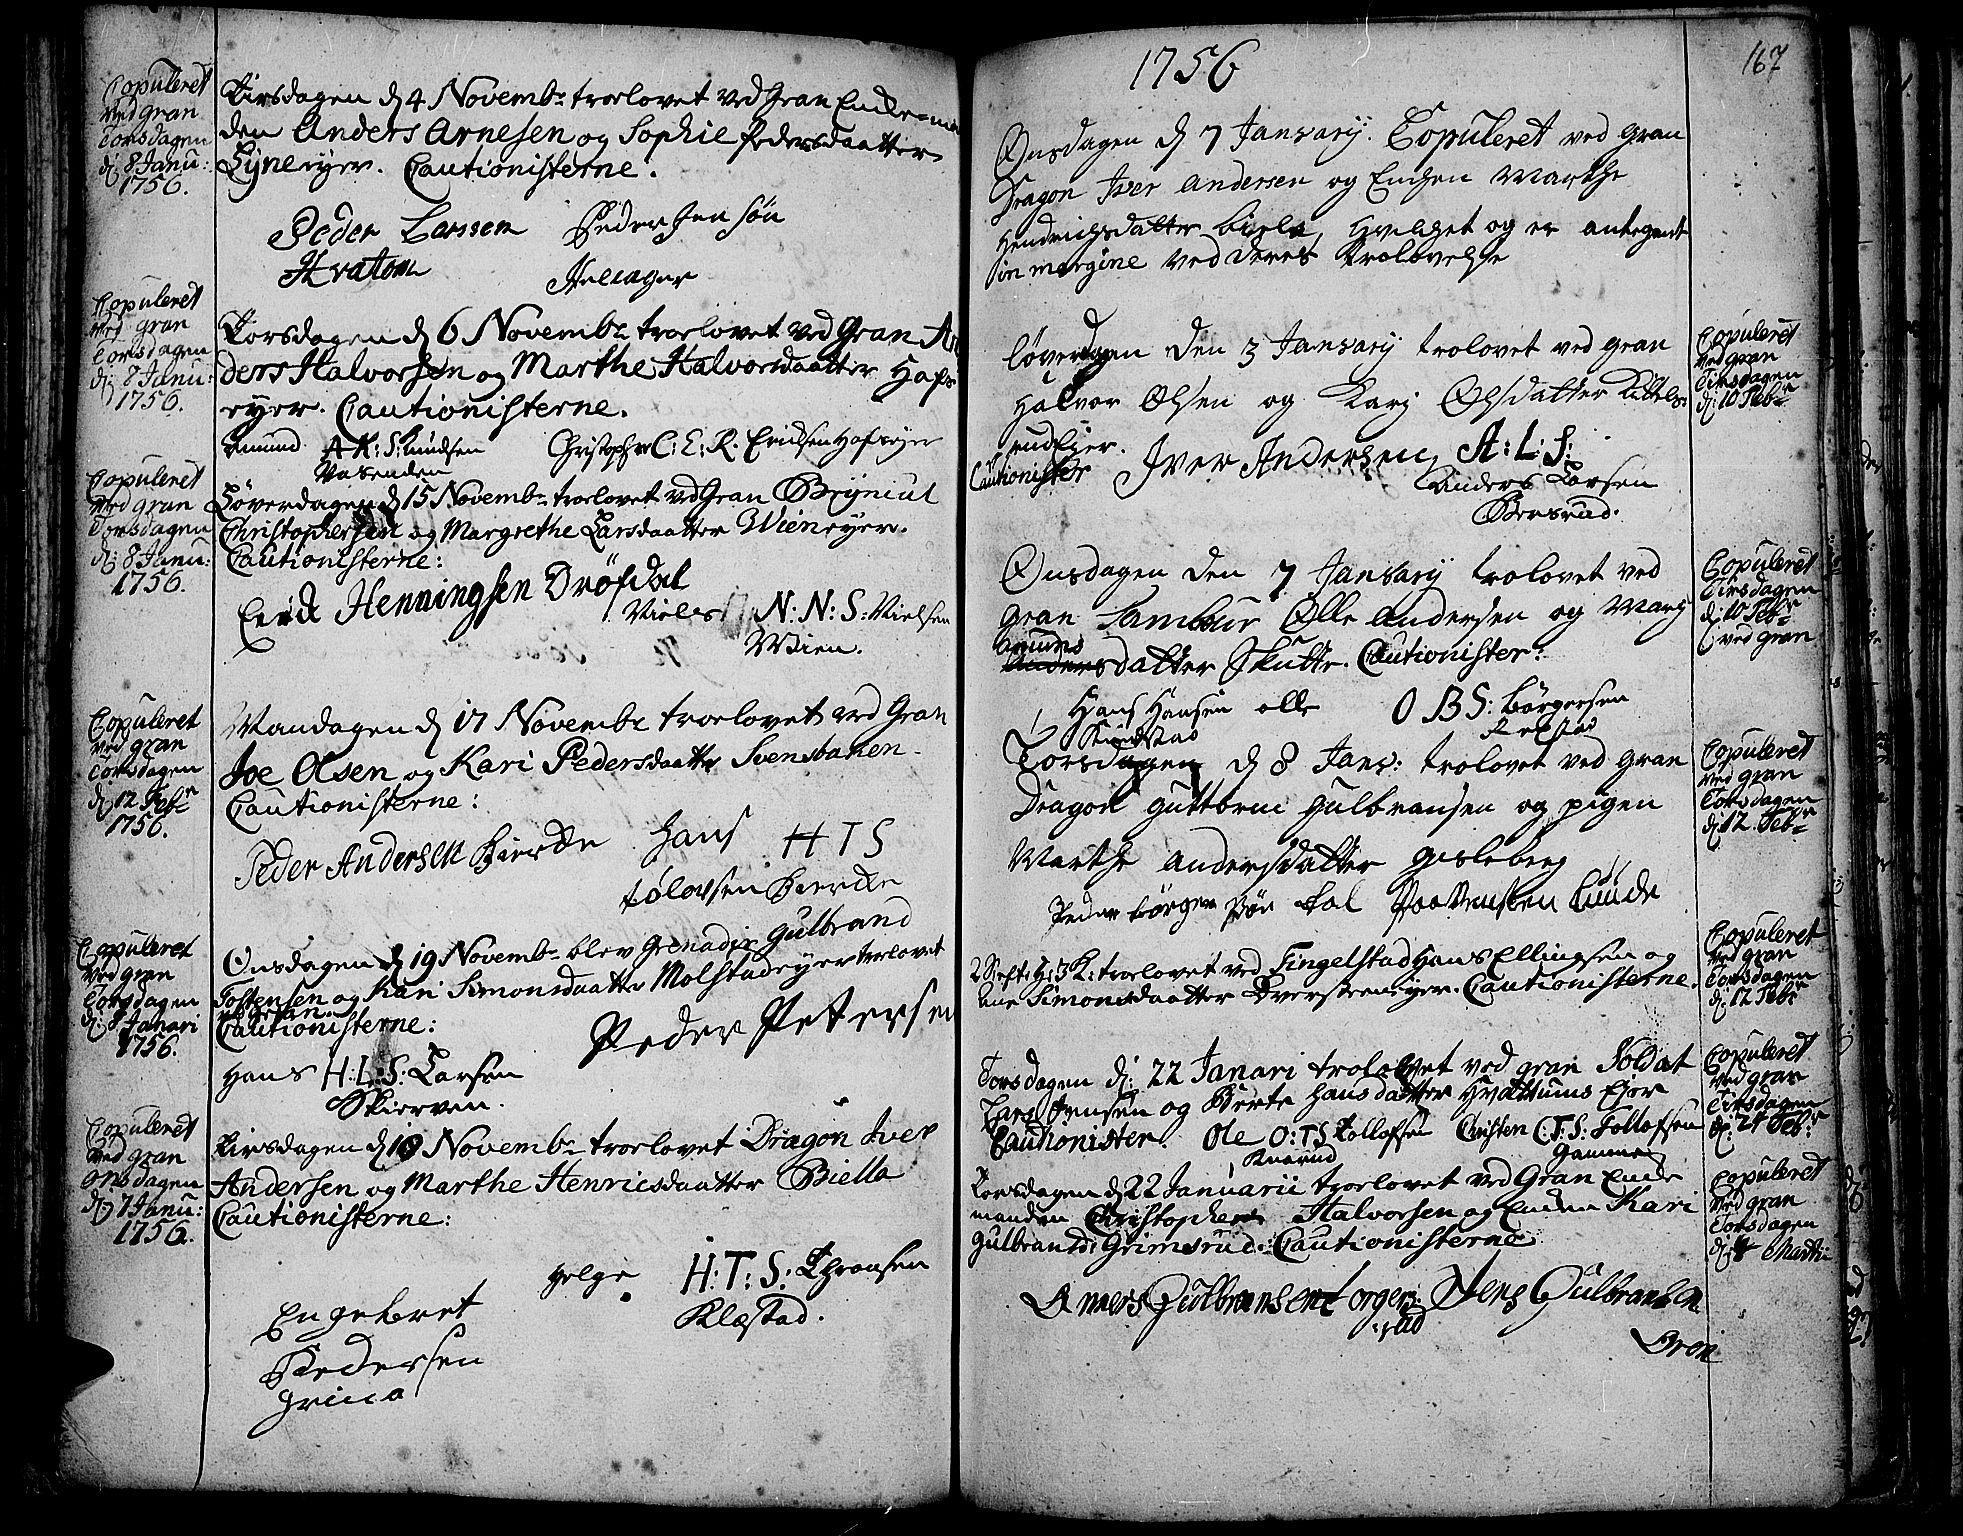 SAH, Gran prestekontor, Ministerialbok nr. 3, 1745-1758, s. 167